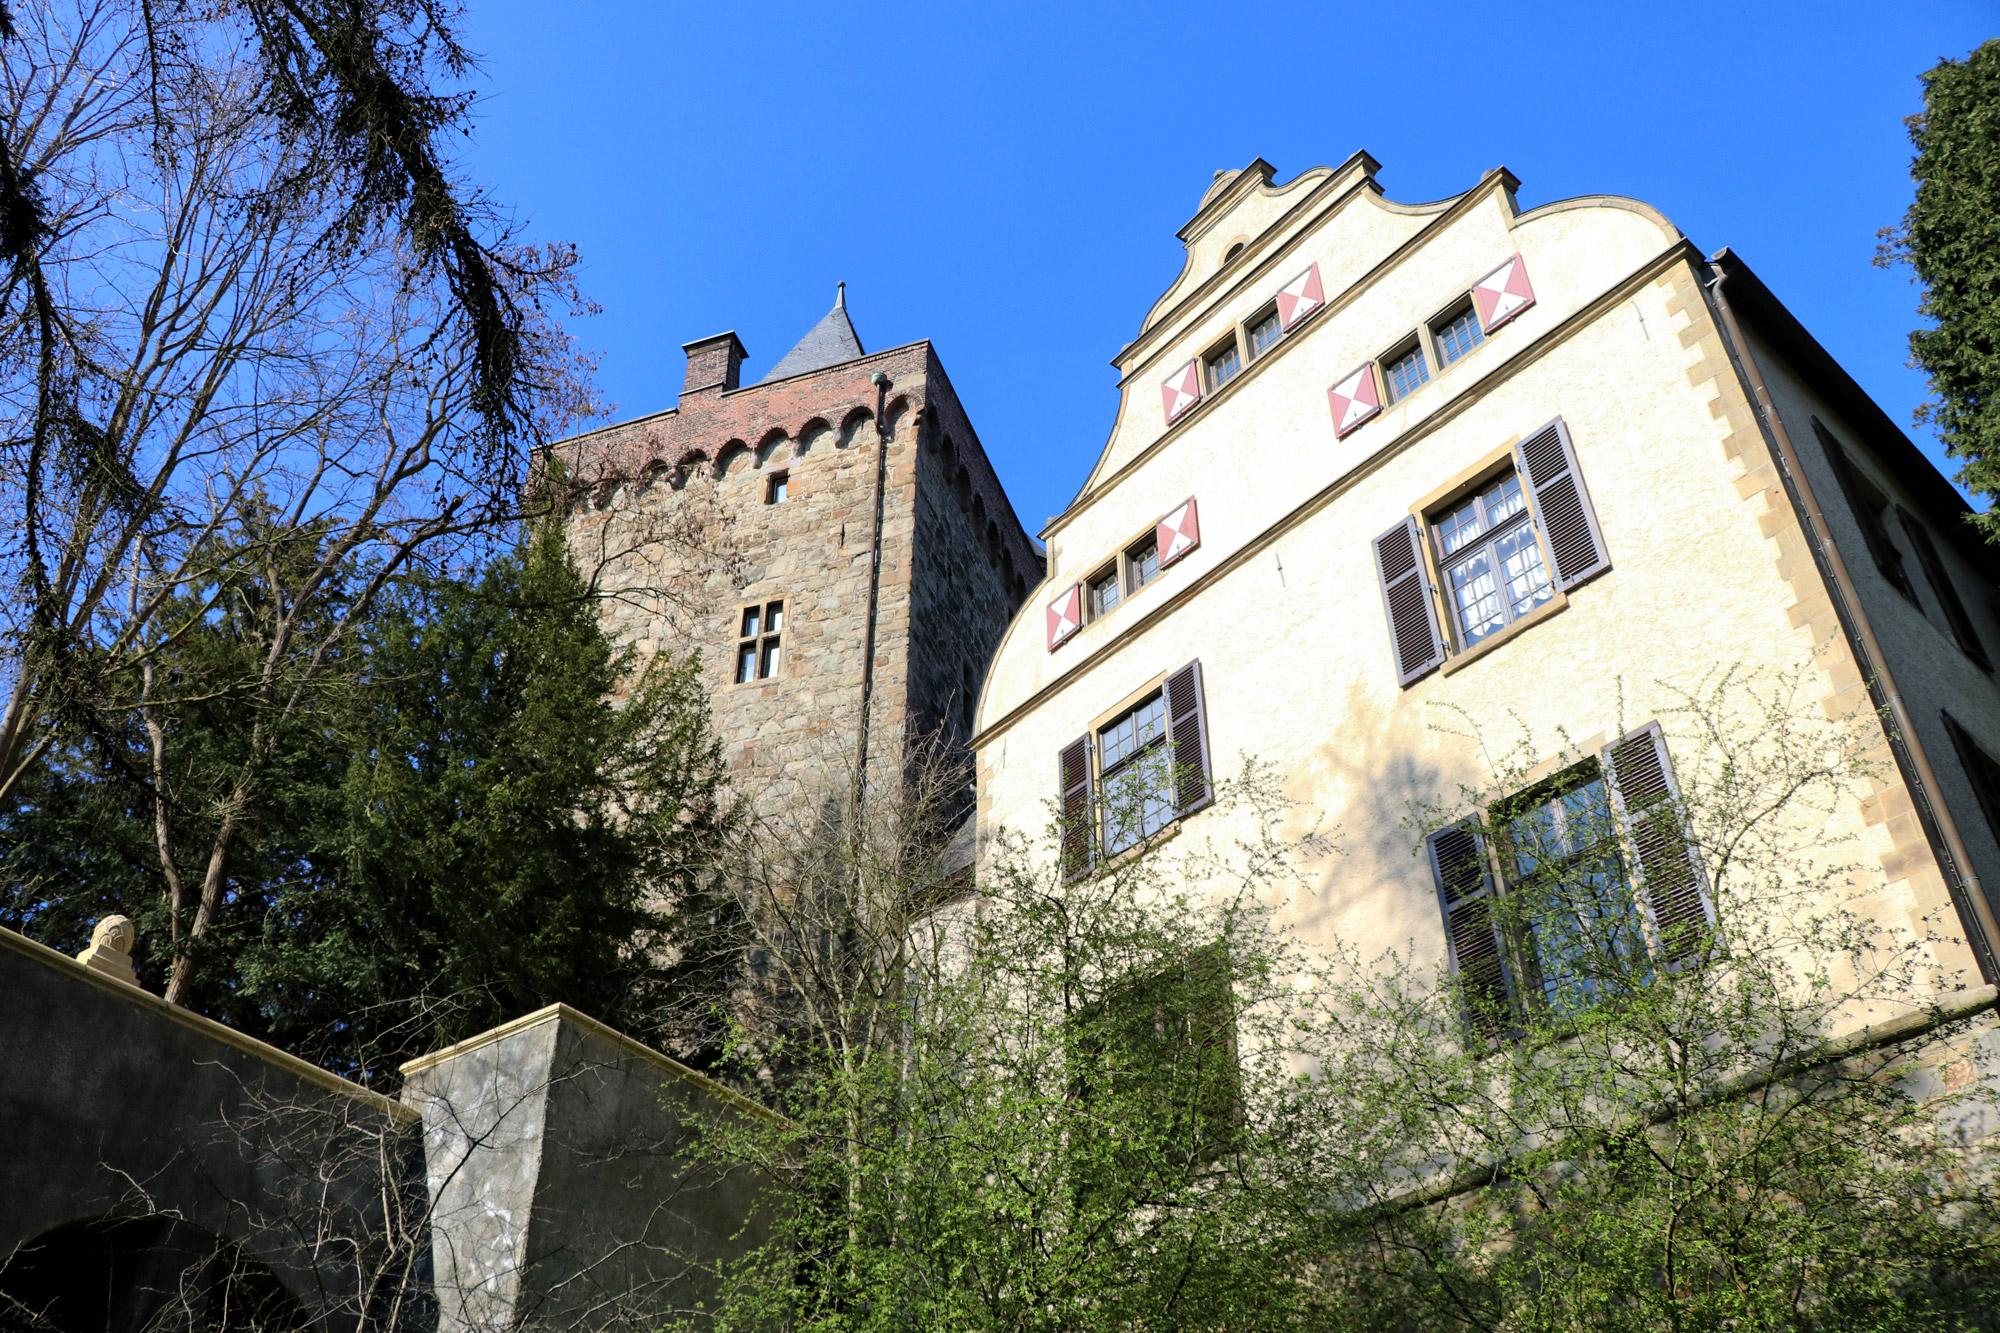 Essen-Kettwig - Schloss Landsberg